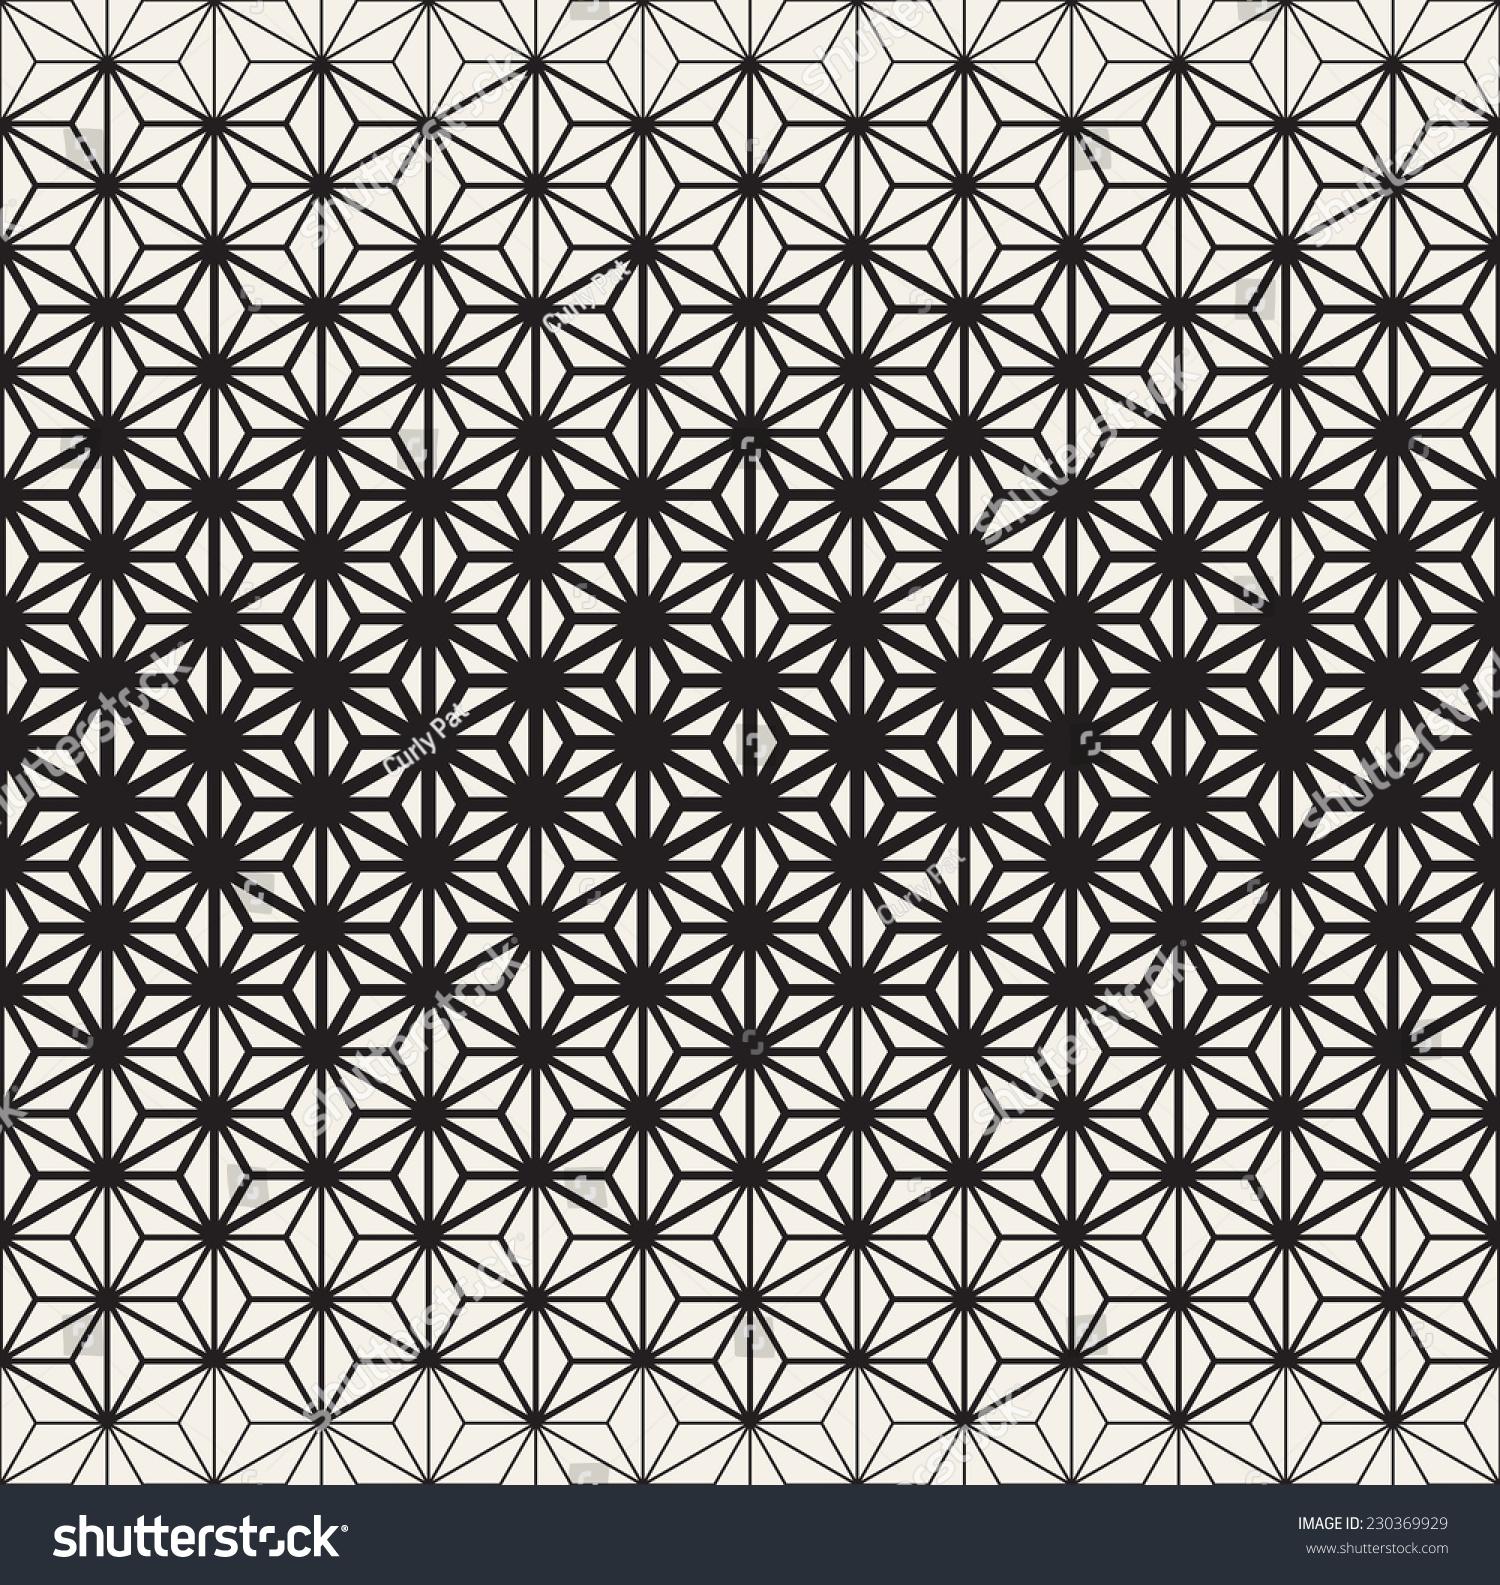 Seamless Geometric Pattern Geometric Reticulate Grid Stock Vector ...